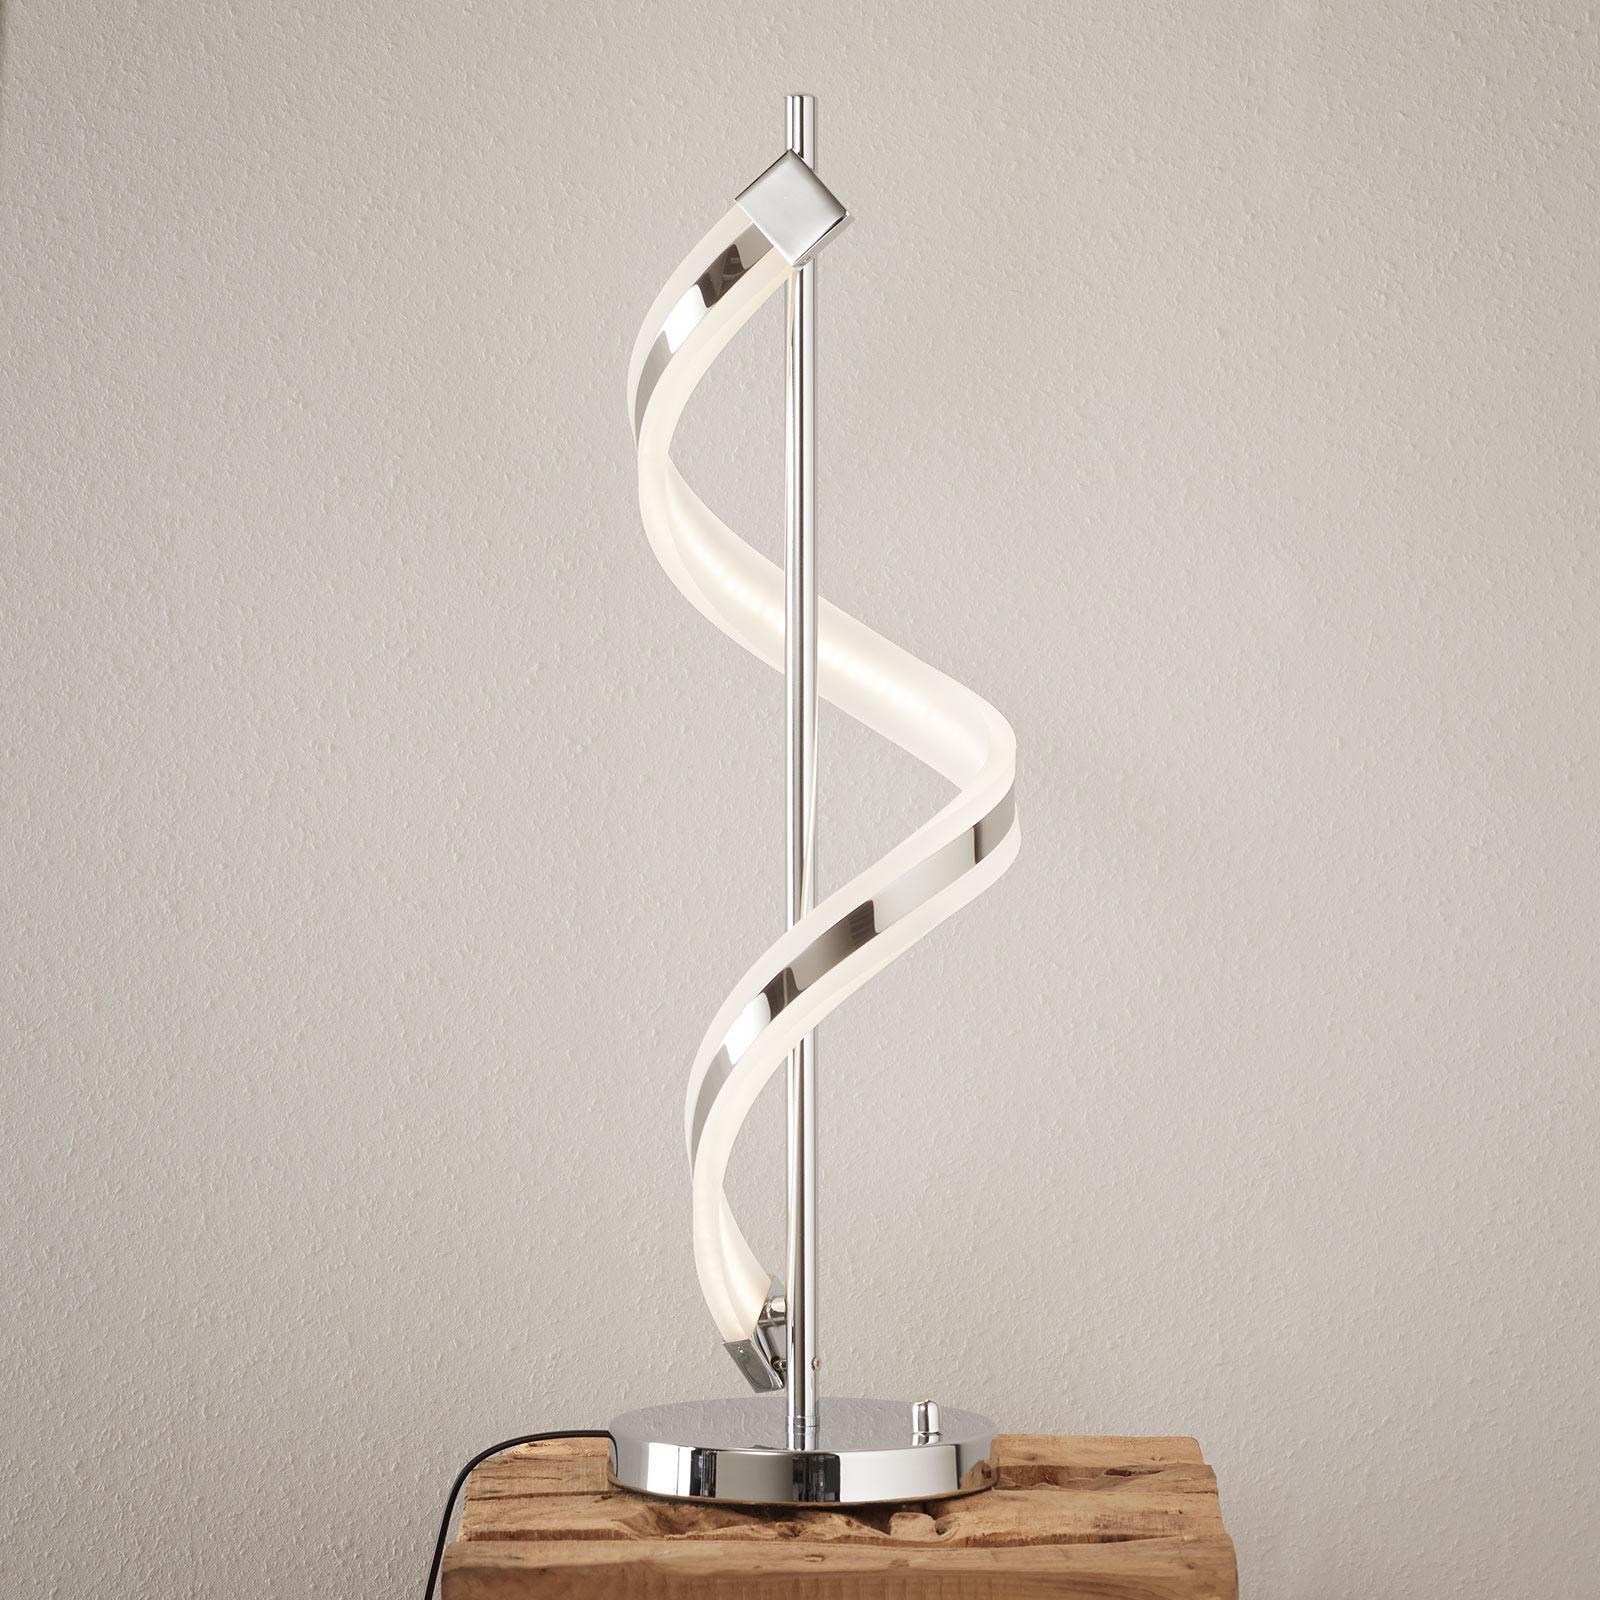 Utrustad med dimmer - LED-bordslampan Sydney